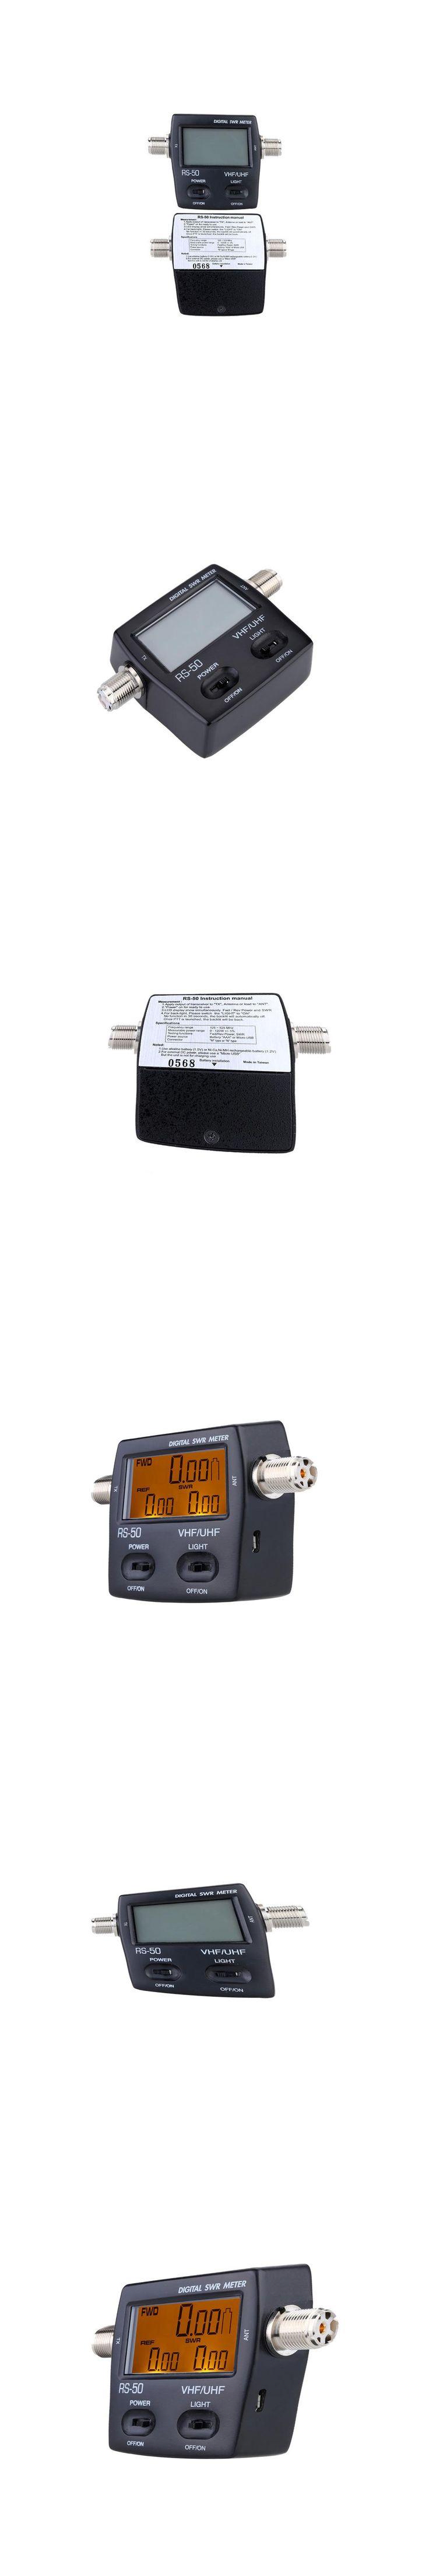 Digital Power Meter SWR Standing Wave Ratio Energy Meters LED Backlight Wattmeter Single Phase120W for HAM UHF/VHF USB Interface